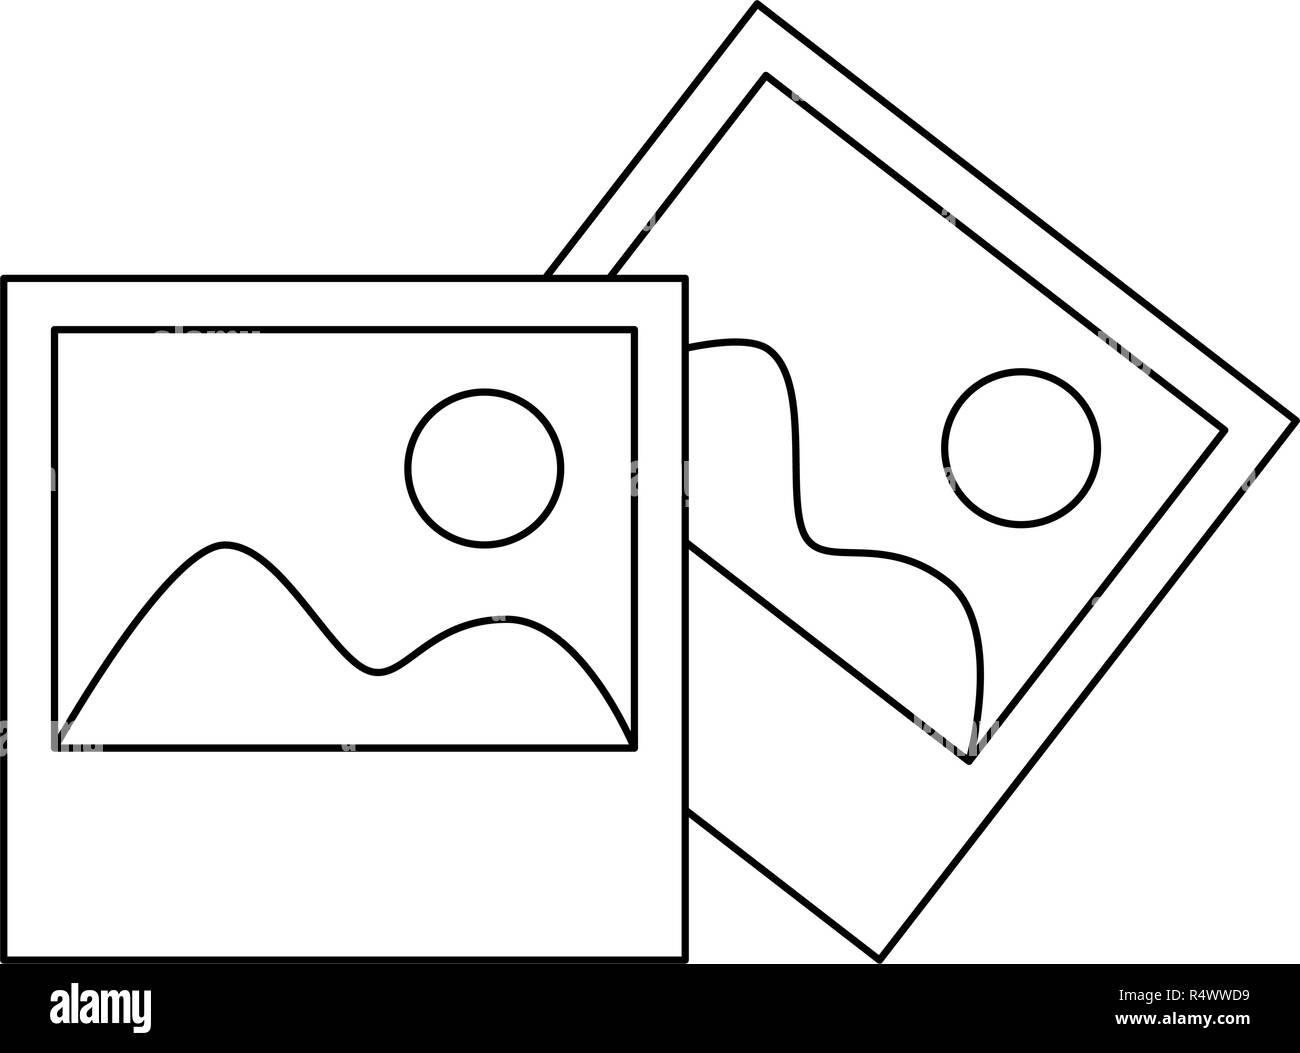 Landscape photos symbol black and white - Stock Image